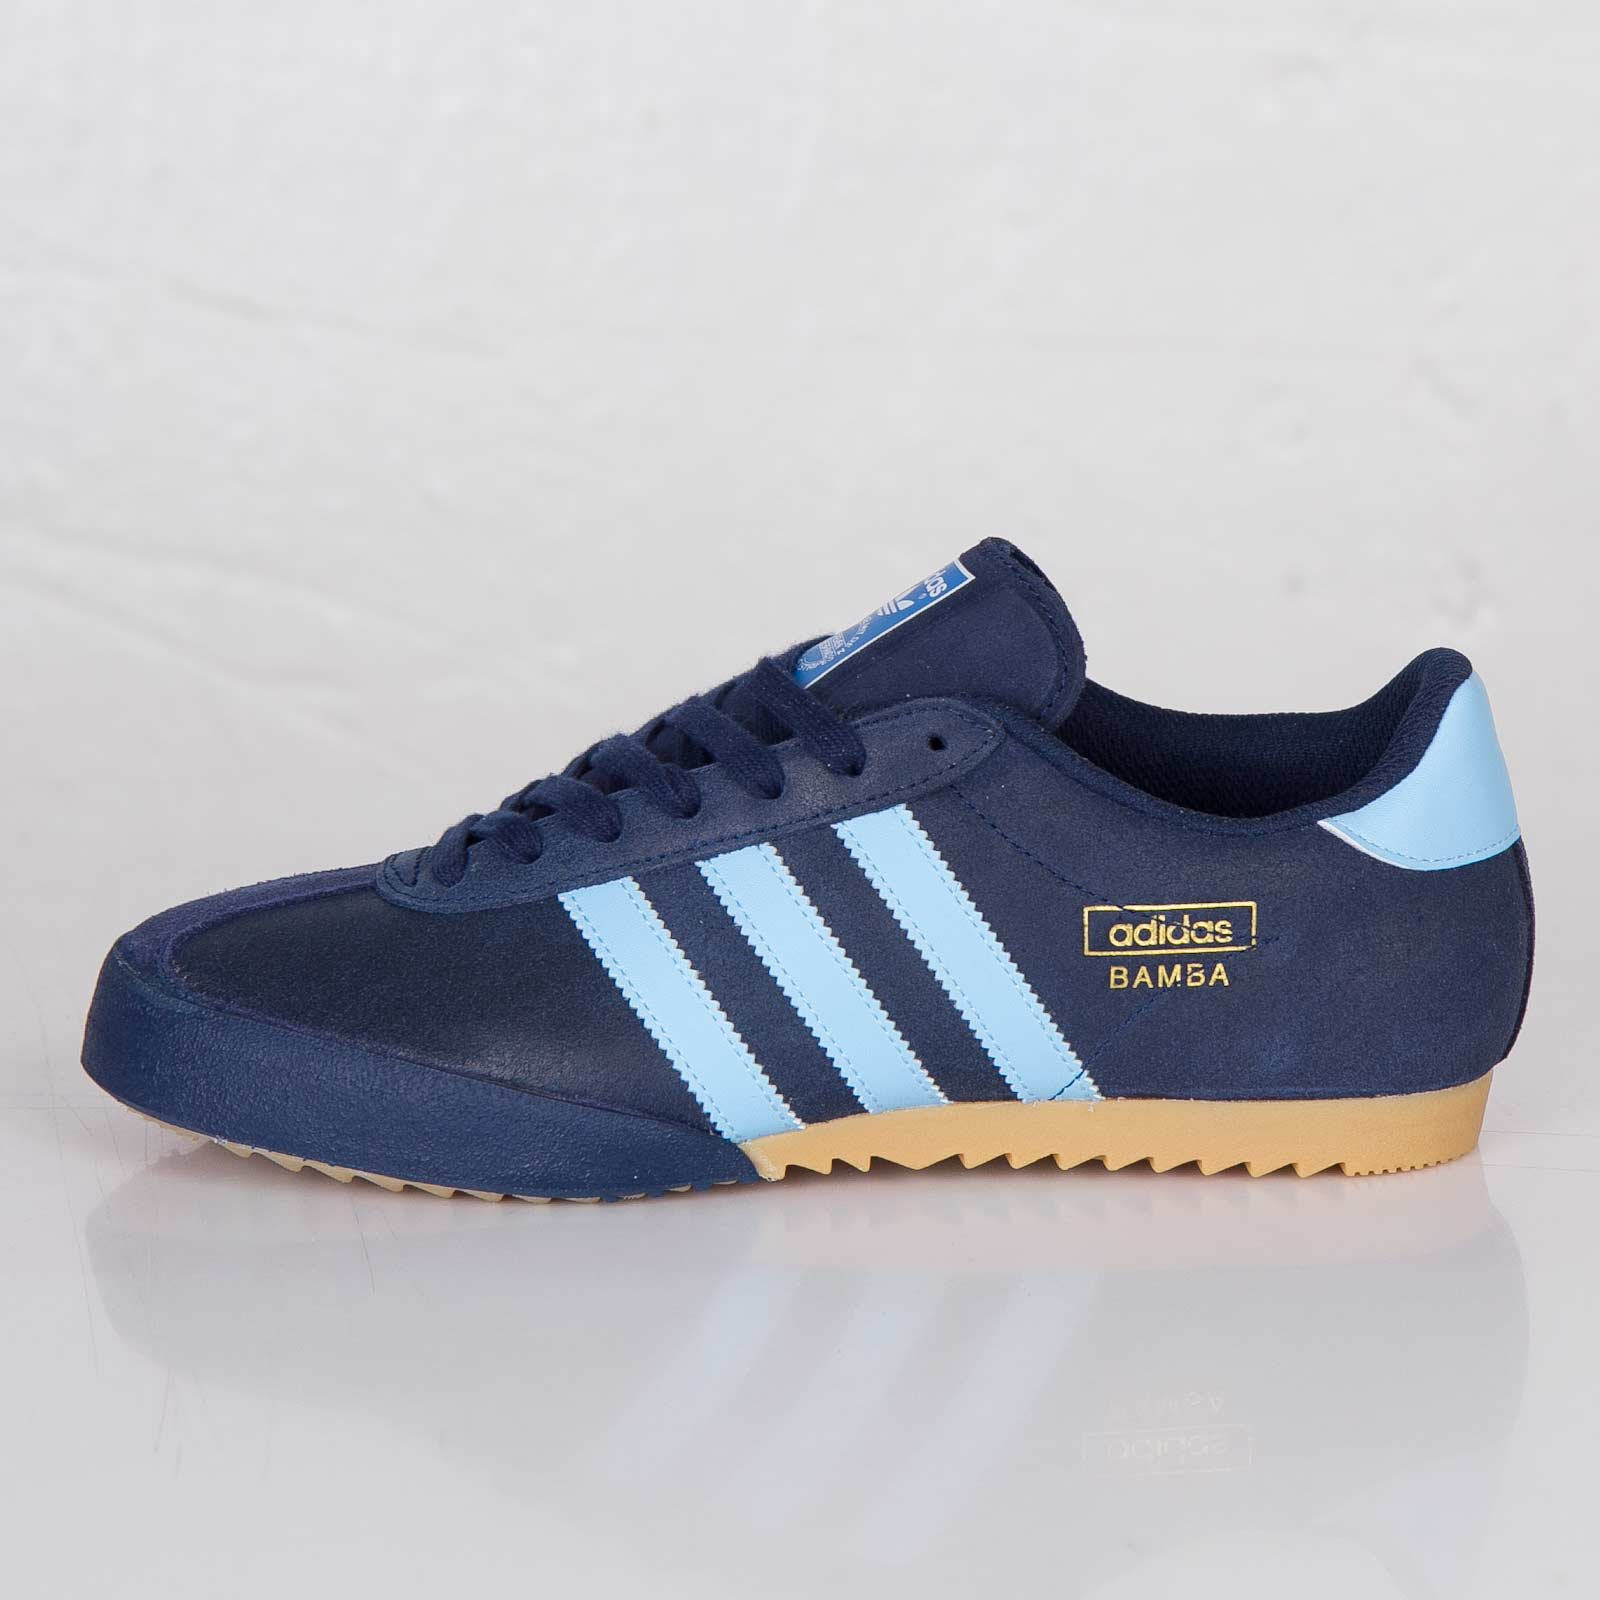 adidas Bamba - D65790 - Sneakersnstuff